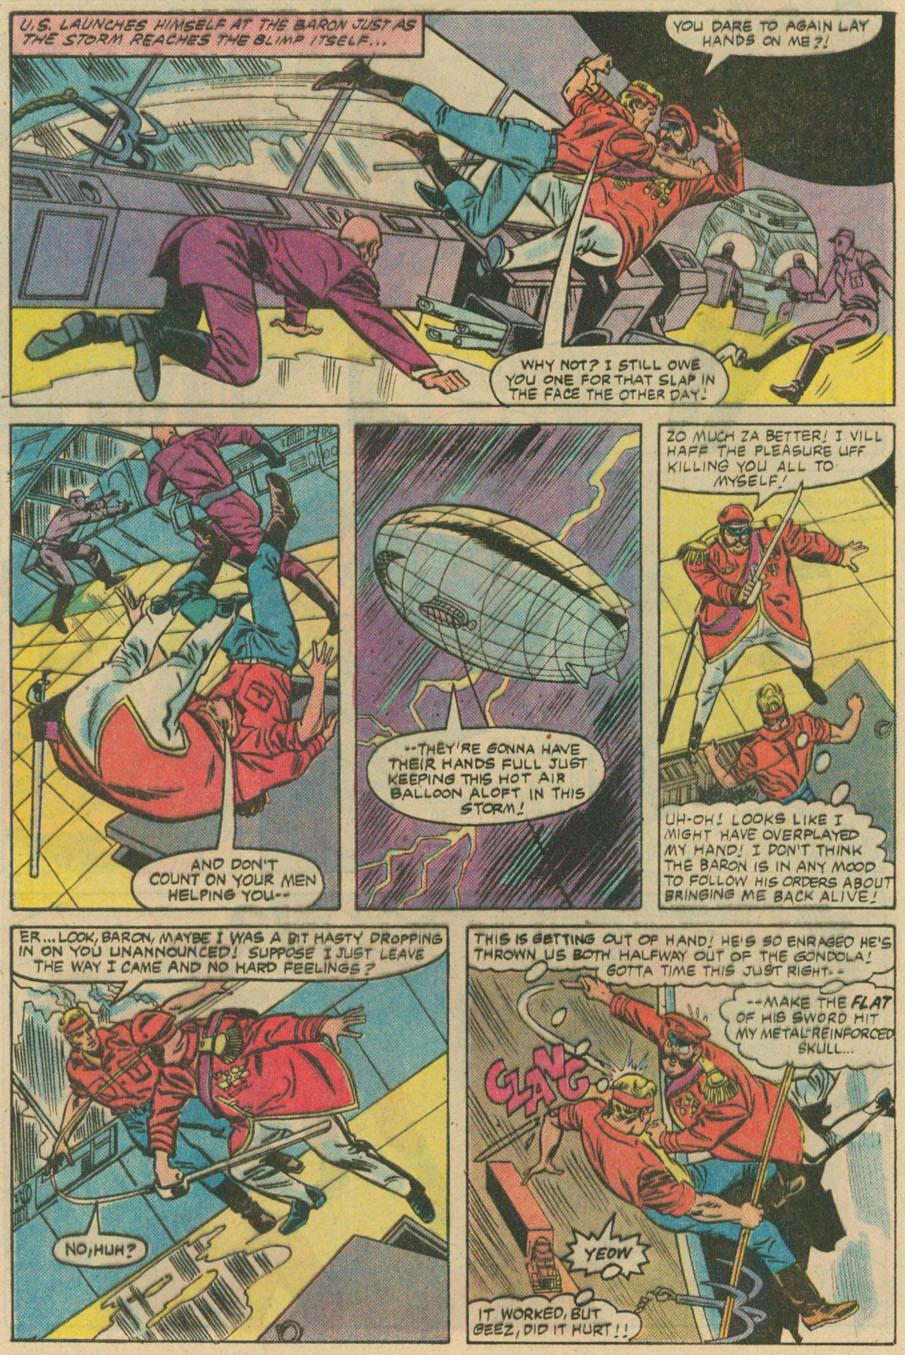 Read online U.S. 1 comic -  Issue #4 - 21